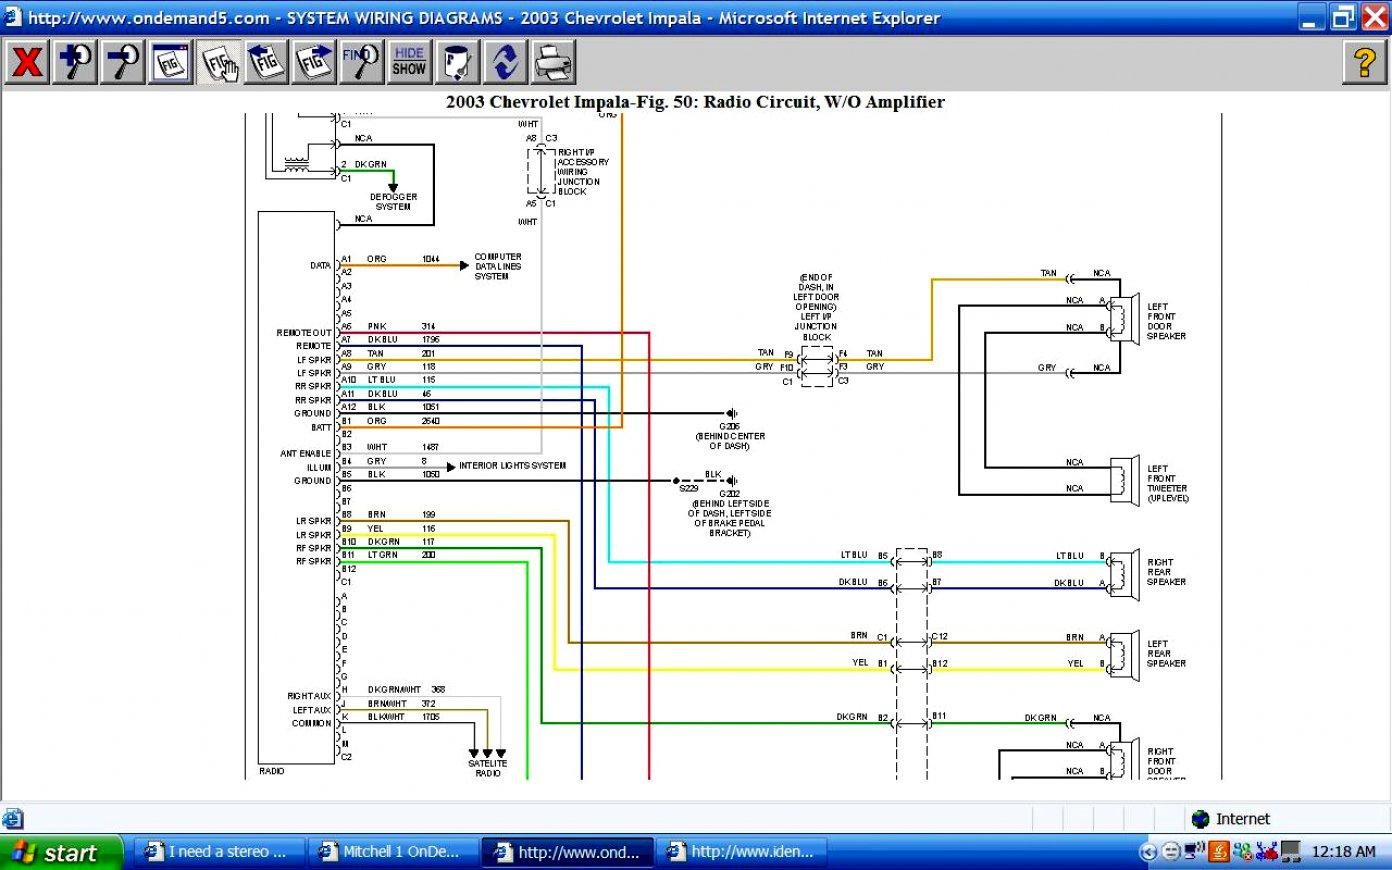 2004 Chevy Cobalt Radio Wiring Diagram | Wiring Diagram - 2007 Chevy Impala Radio Wiring Diagram